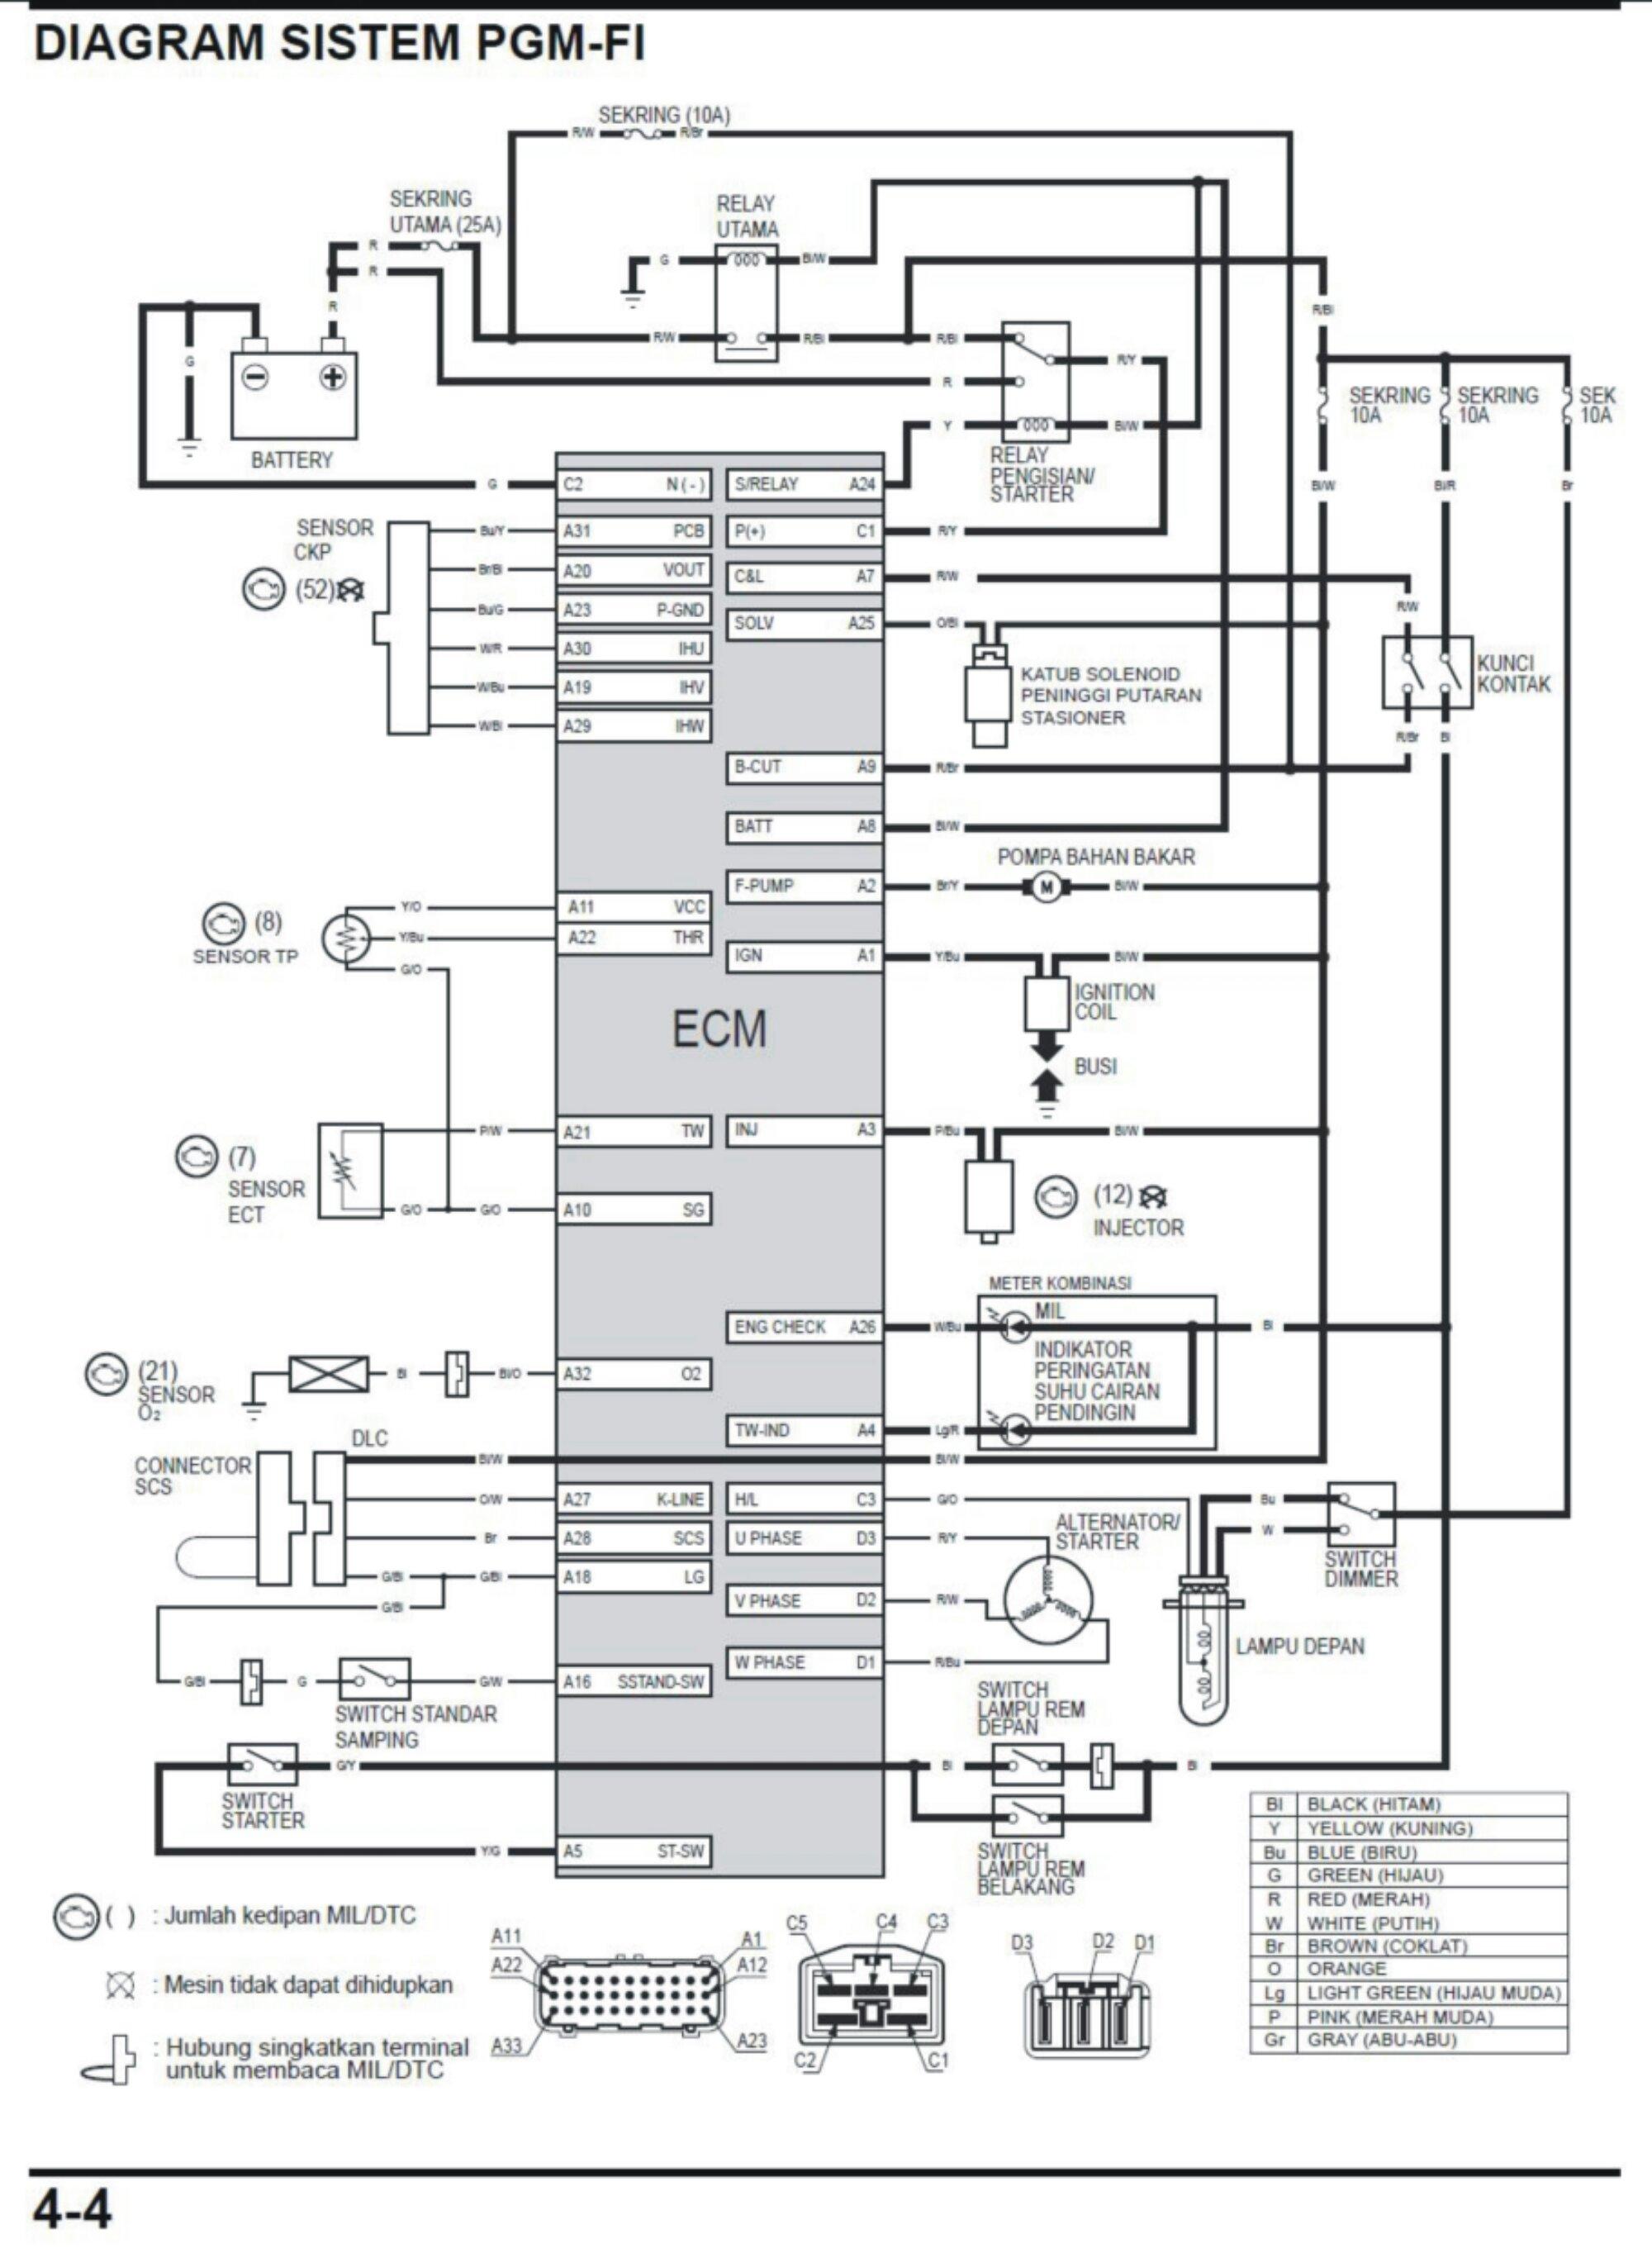 Wiring diagram vario 150 cs1 masih fahrur rozi tags diagram sc1stwiring diagrams asfbconference2016 Gallery